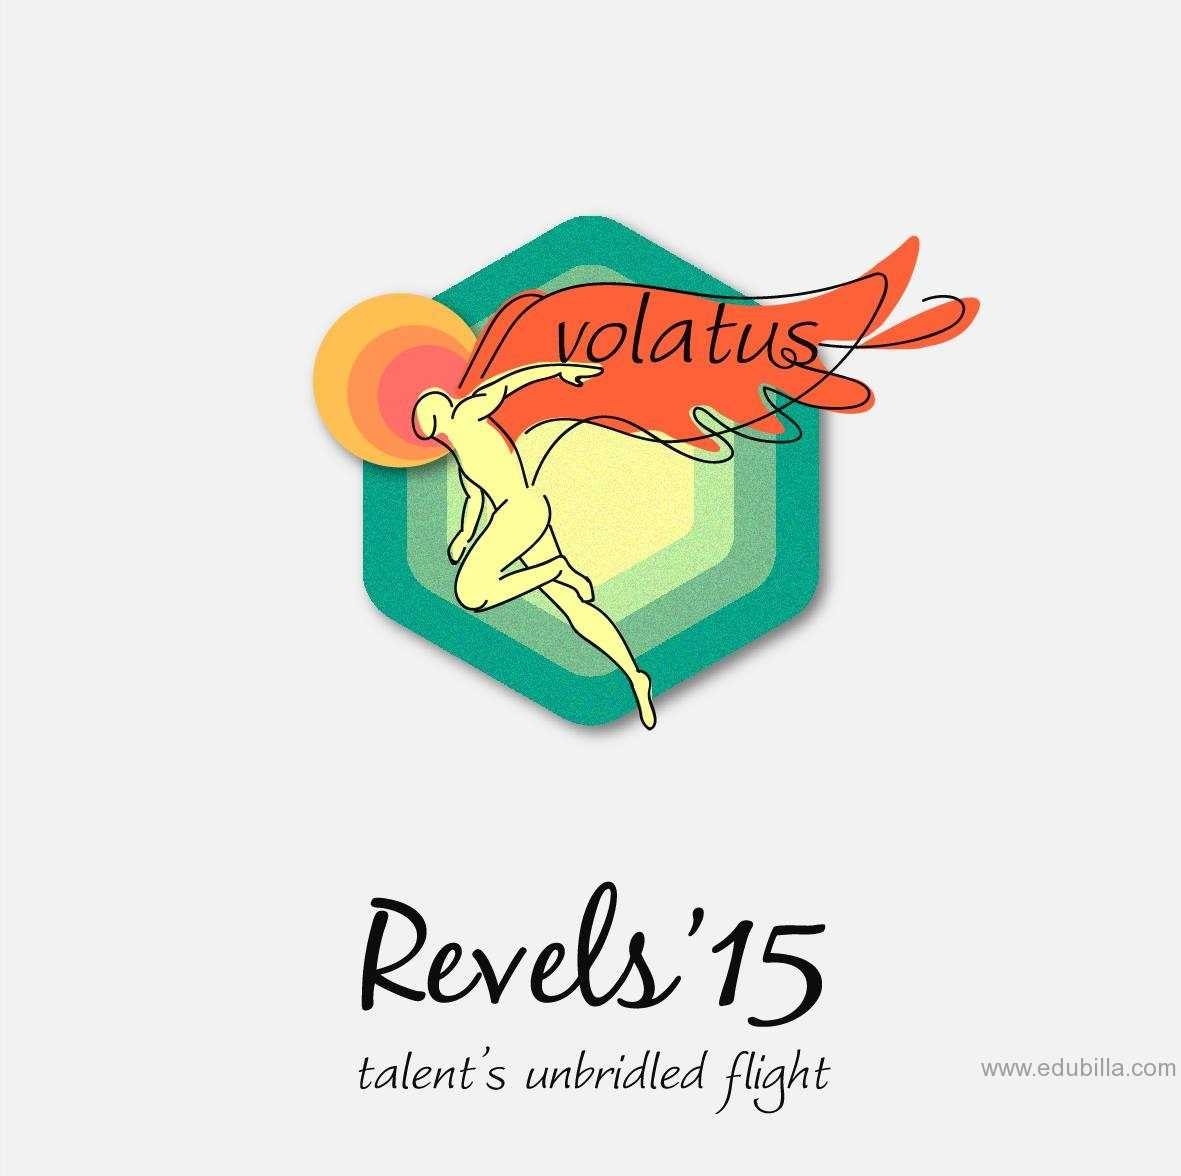 Revels 2015